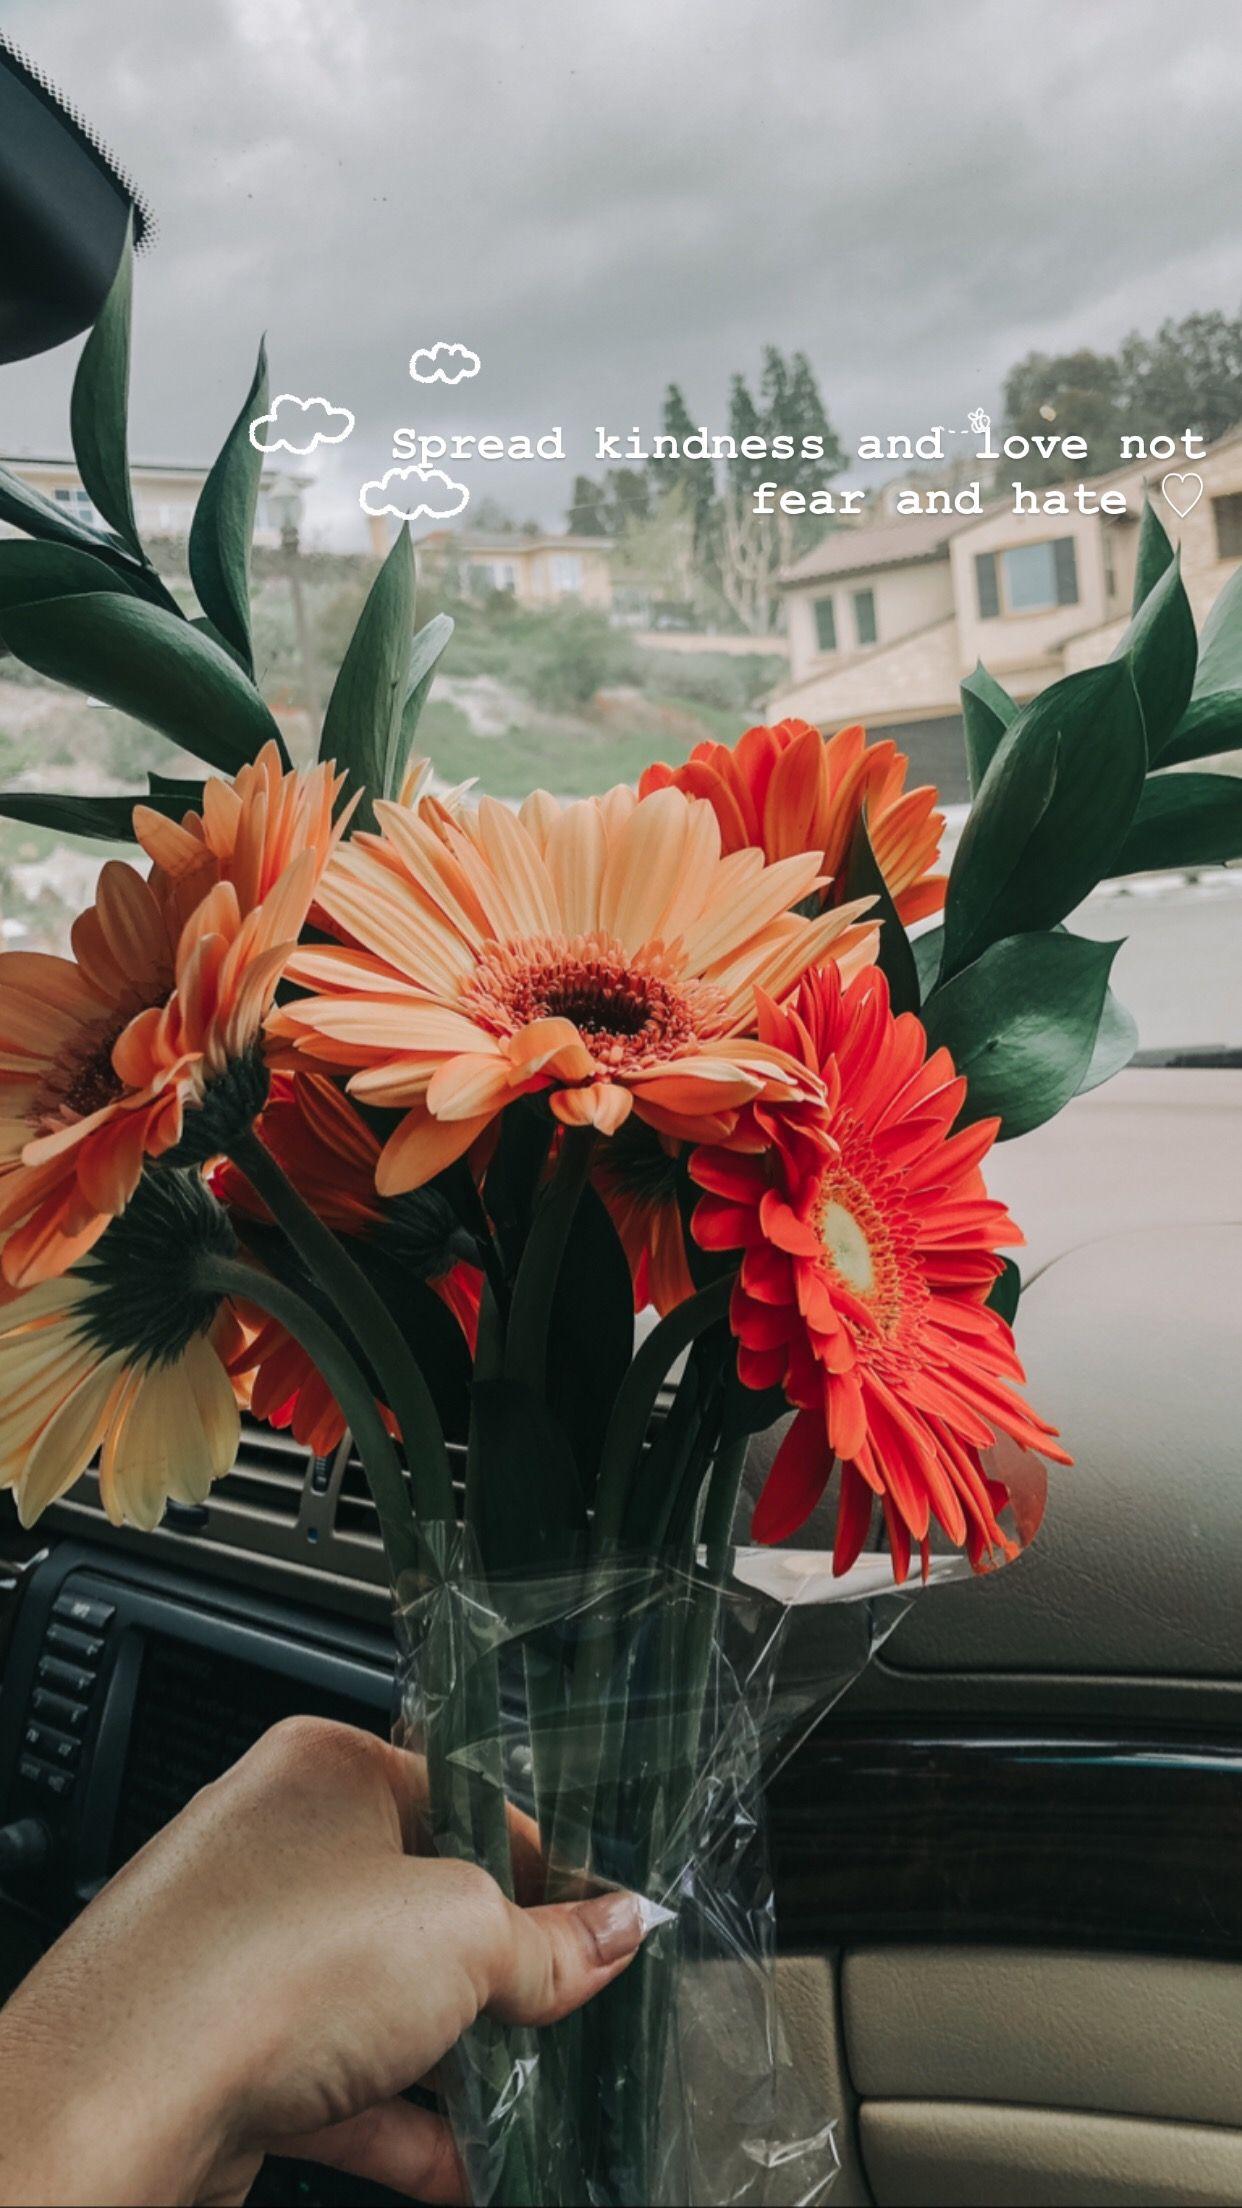 . . . . . #love #quotesforlife #flowerlover #quoteoftheday #kind #quotesdaily #quotestagram #quotesandsayings #quotes #quotestags #dailyquotes #quoted #thoughts #qotd #flower #flowerlovers #flowersofinstagram #flowergram #lifequotes #flowerslovers #kindess #kindnessmatters #quotesoftheday #flowerpower #quotestoliveby #actsofkindness #actofkindness #flowerstagram #quotesilove #bekind